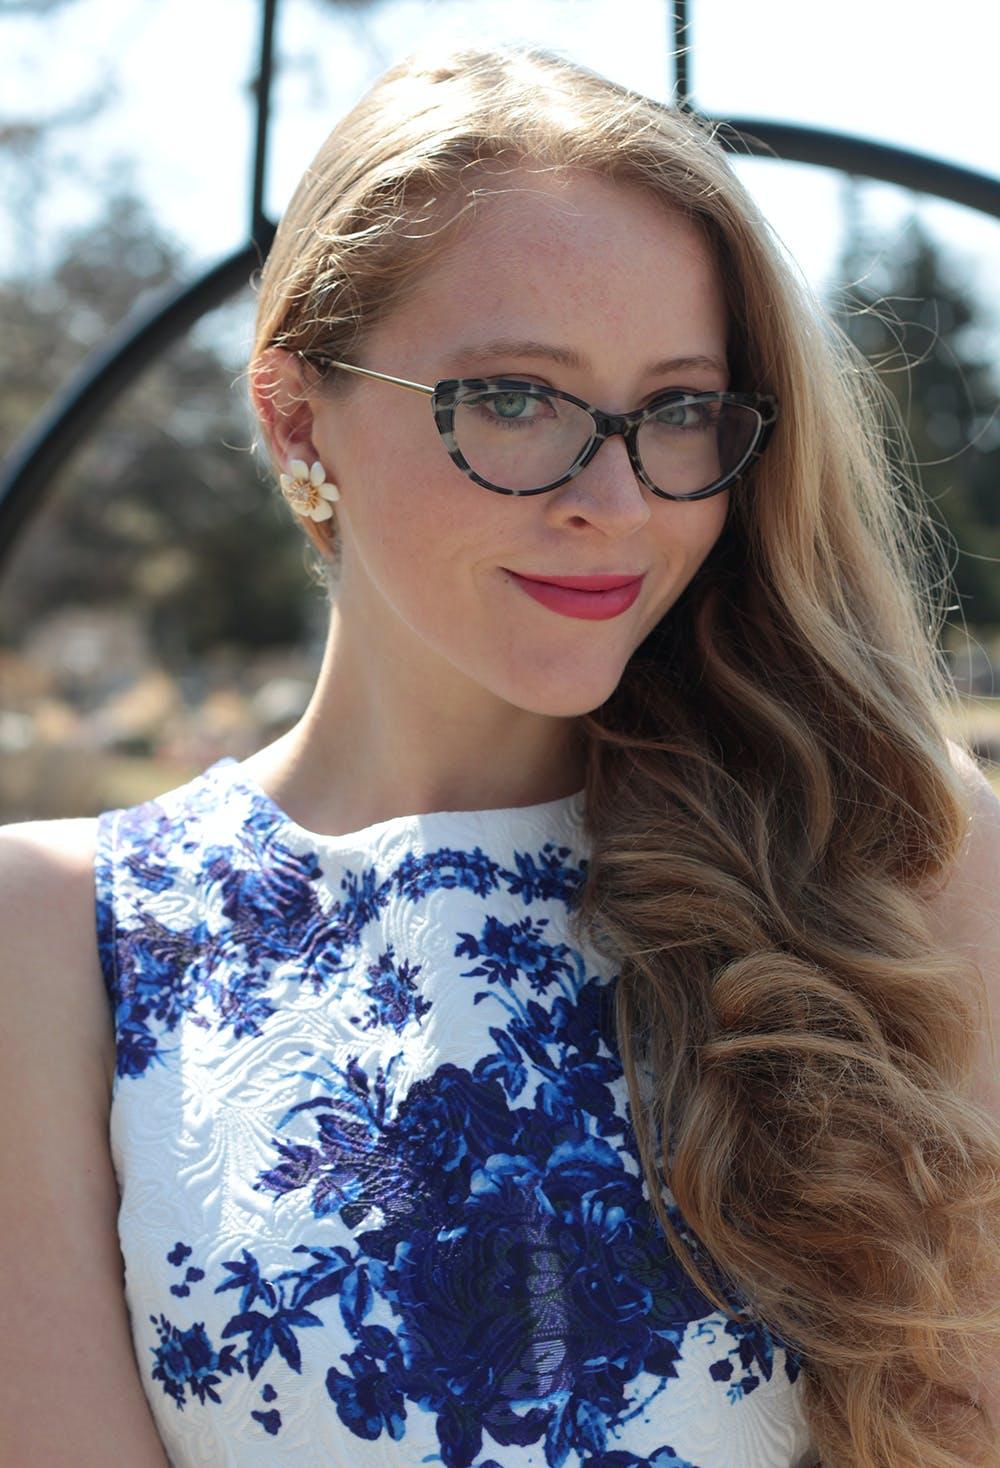 Mad Men Style: YSL cat-eye glasses & blue floral dress